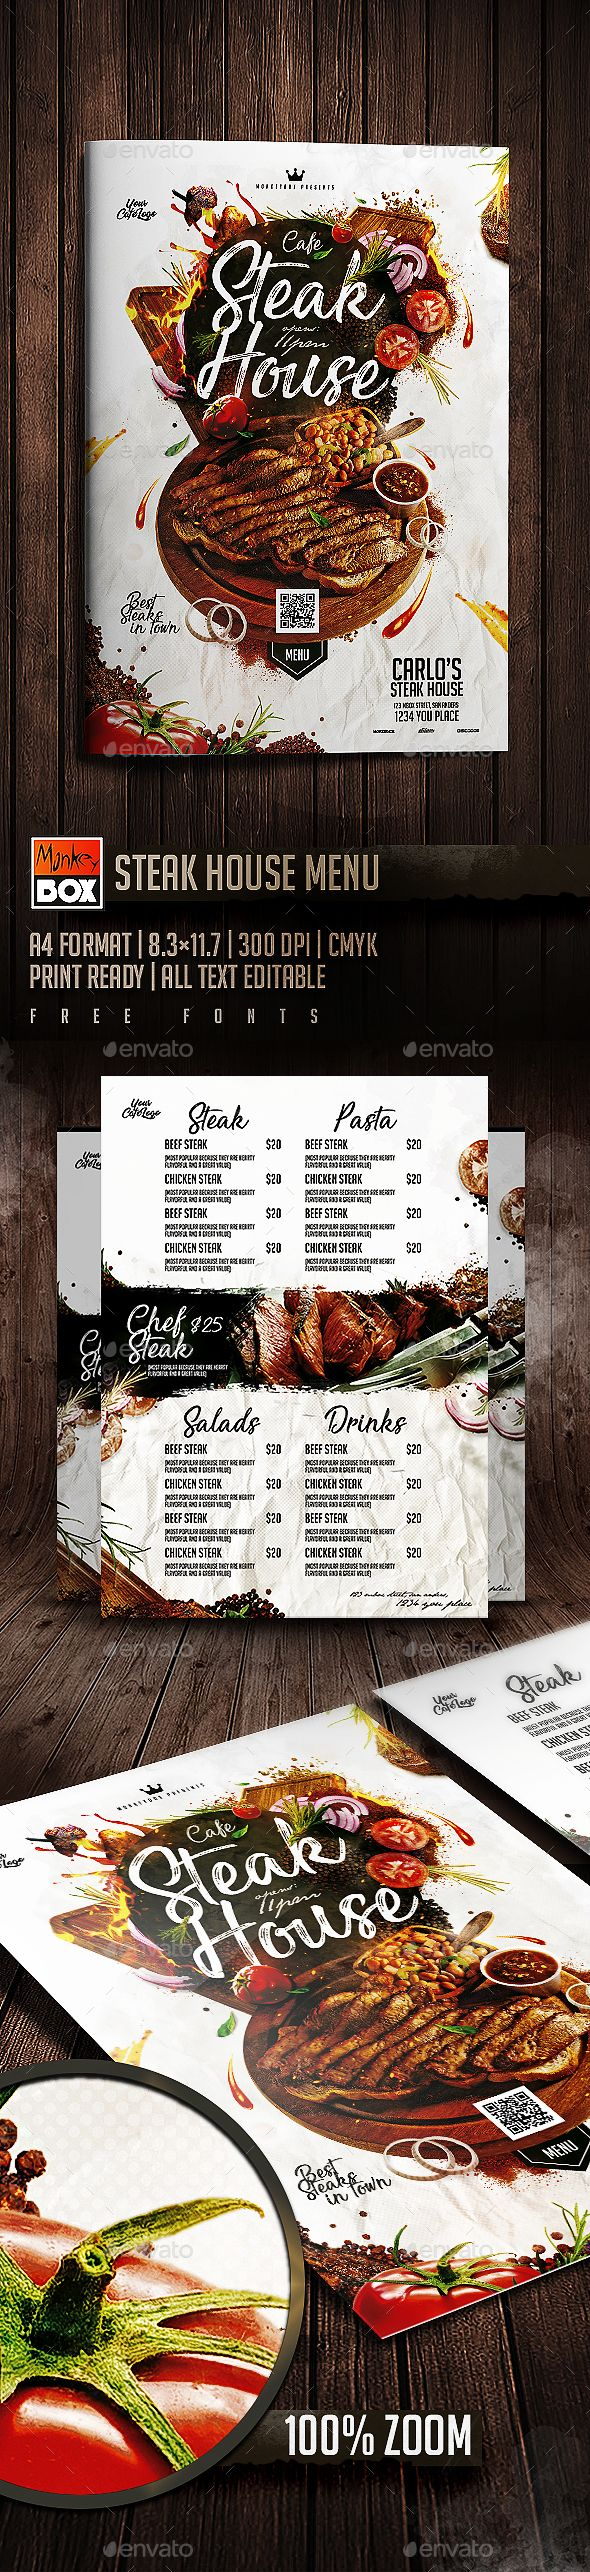 Steak House Menu - Food Menus Print Templates